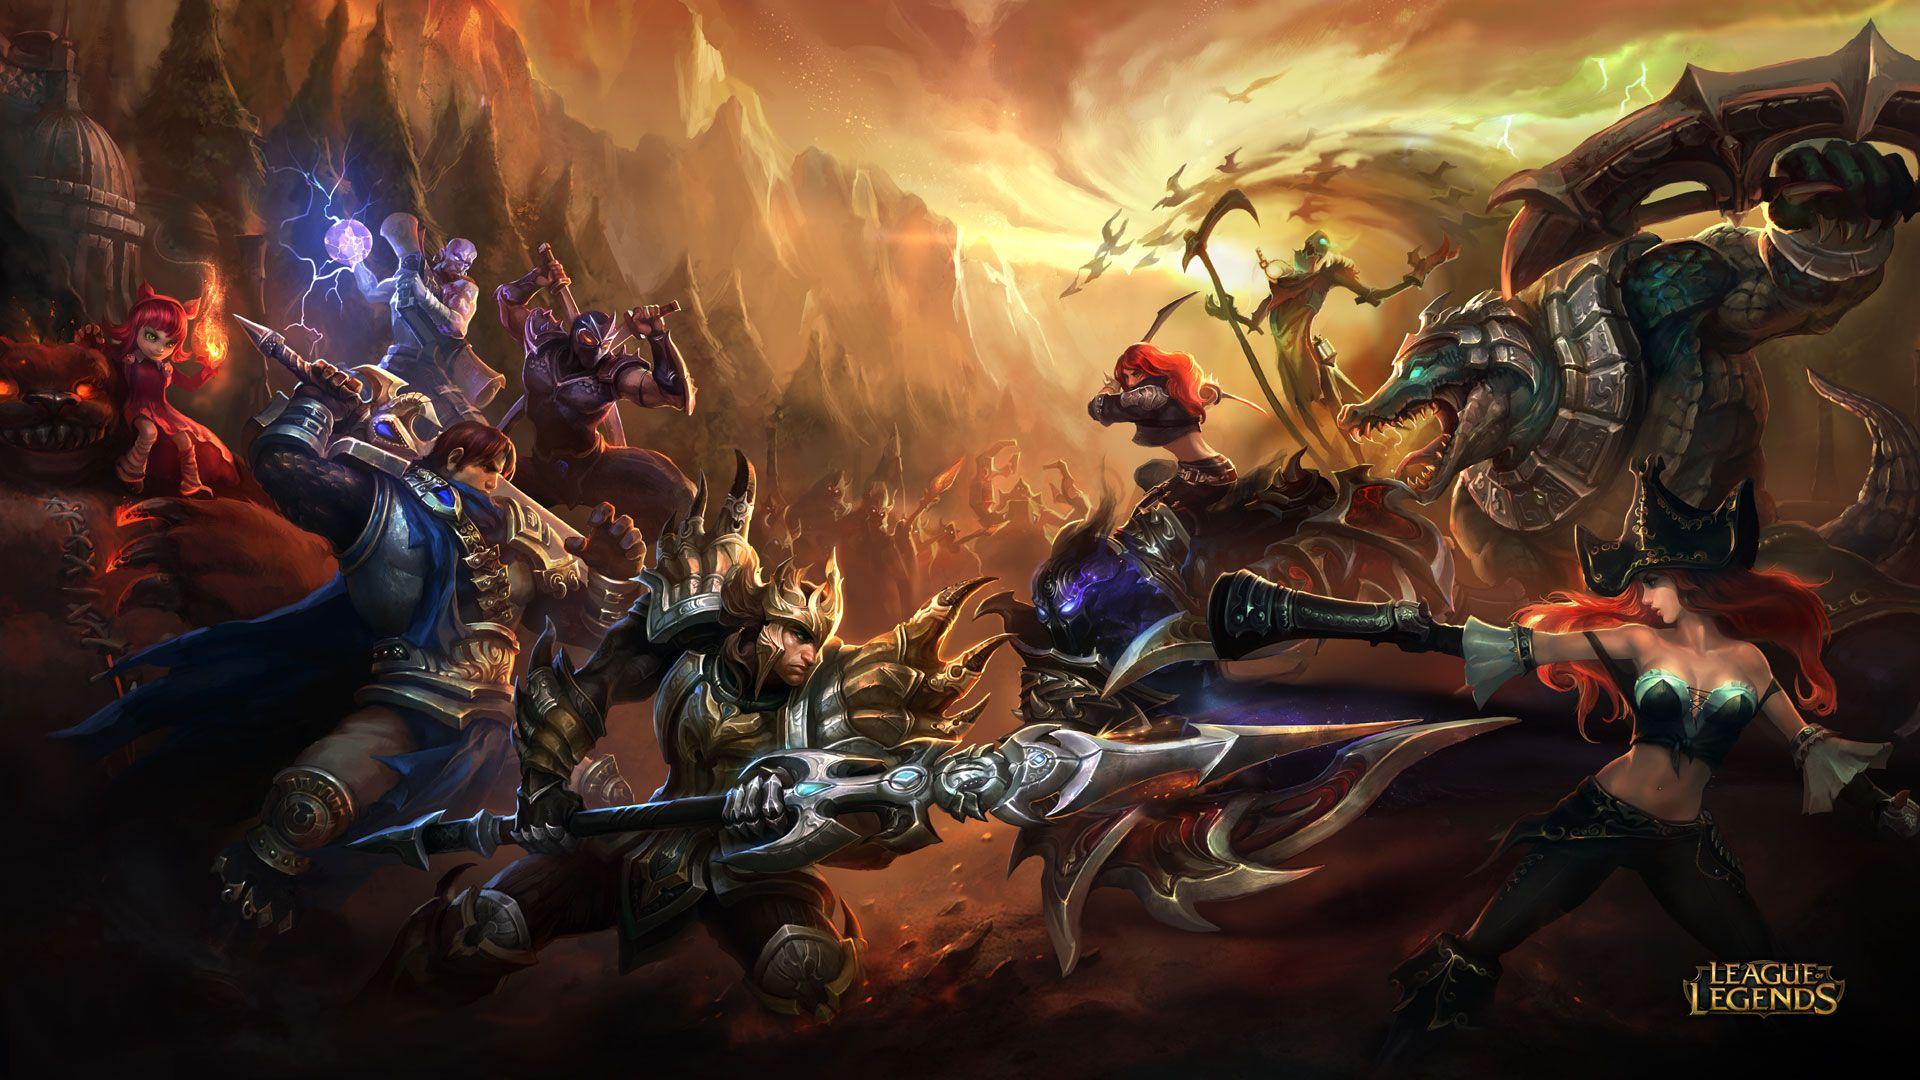 Jarvan IV vs Nocturne - League of Legends Wallpapers